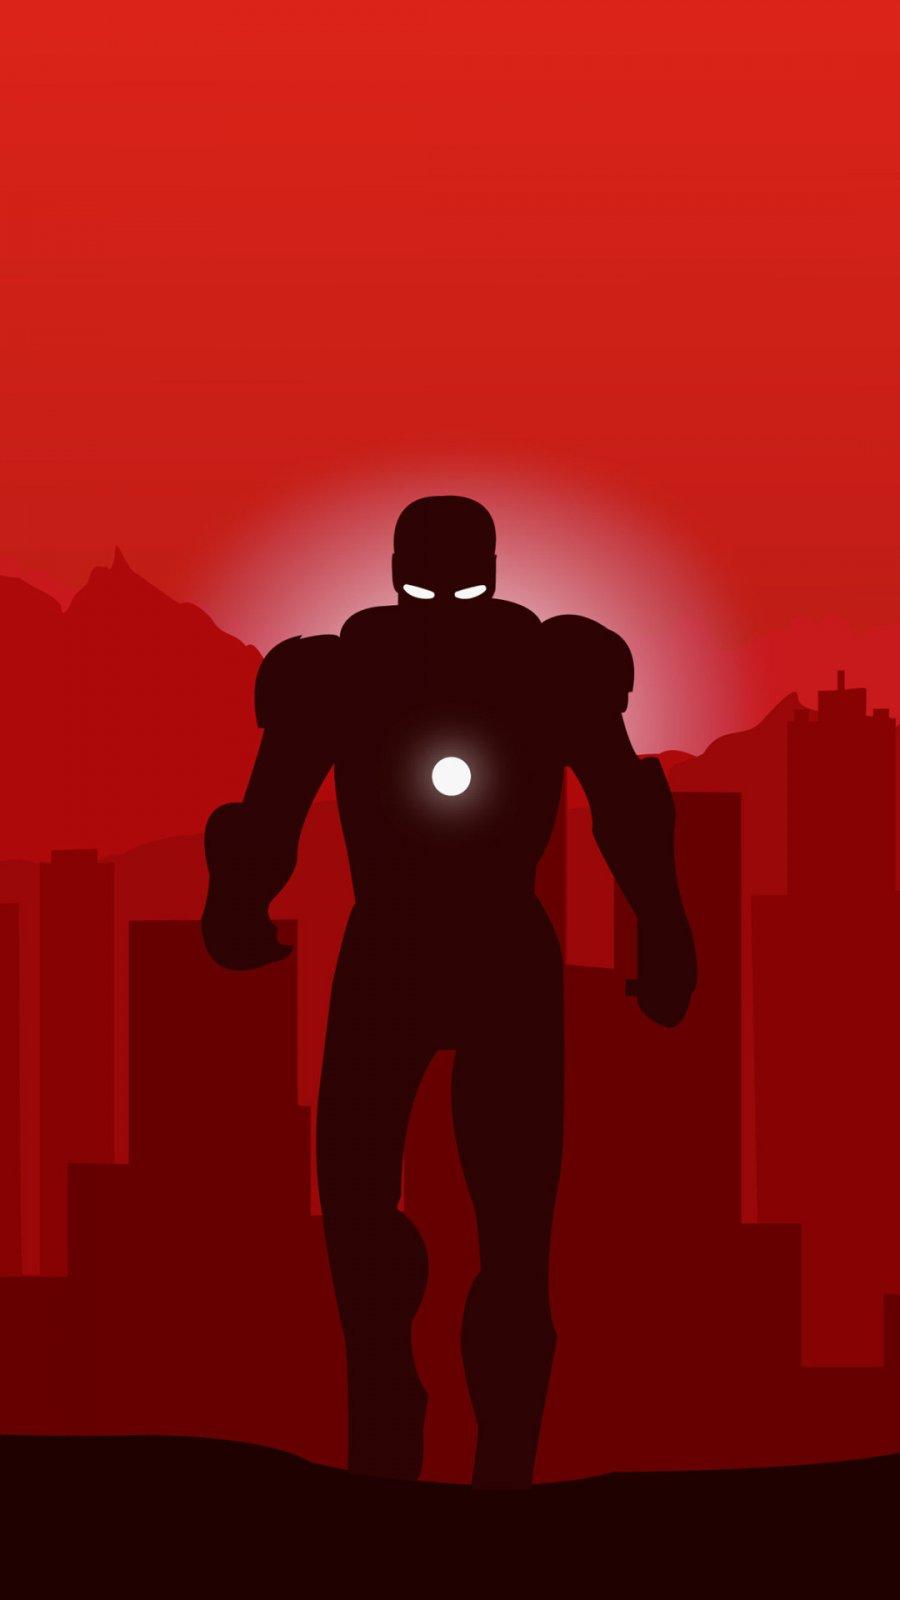 Iron Man Red iPhone Wallpaper